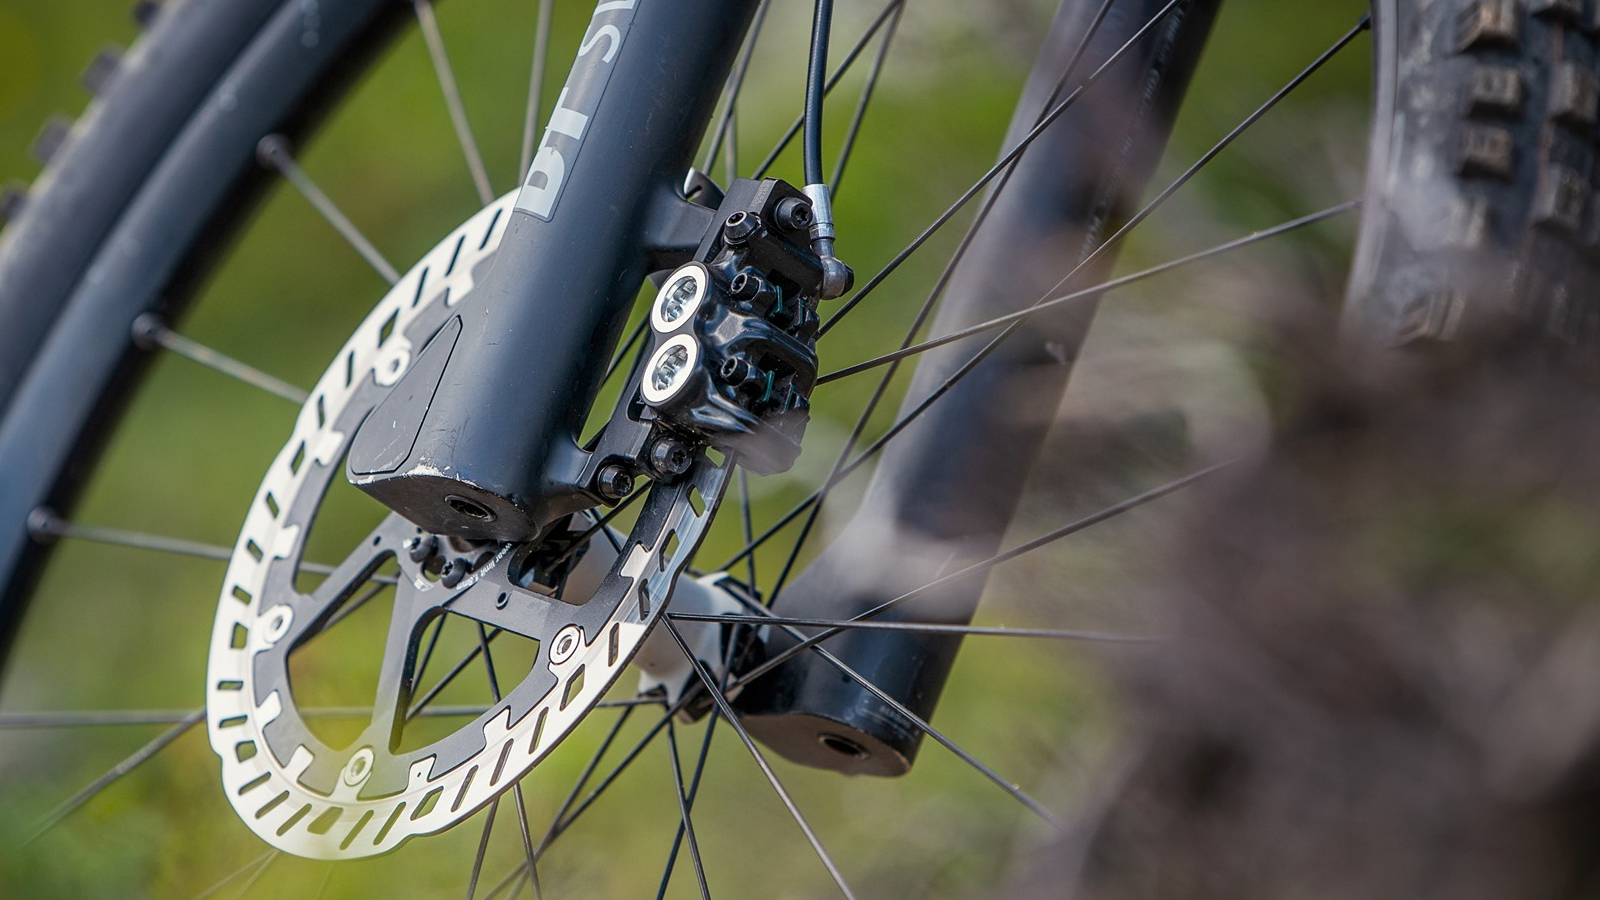 Magura mountain bike brakes - a comprehensive overview